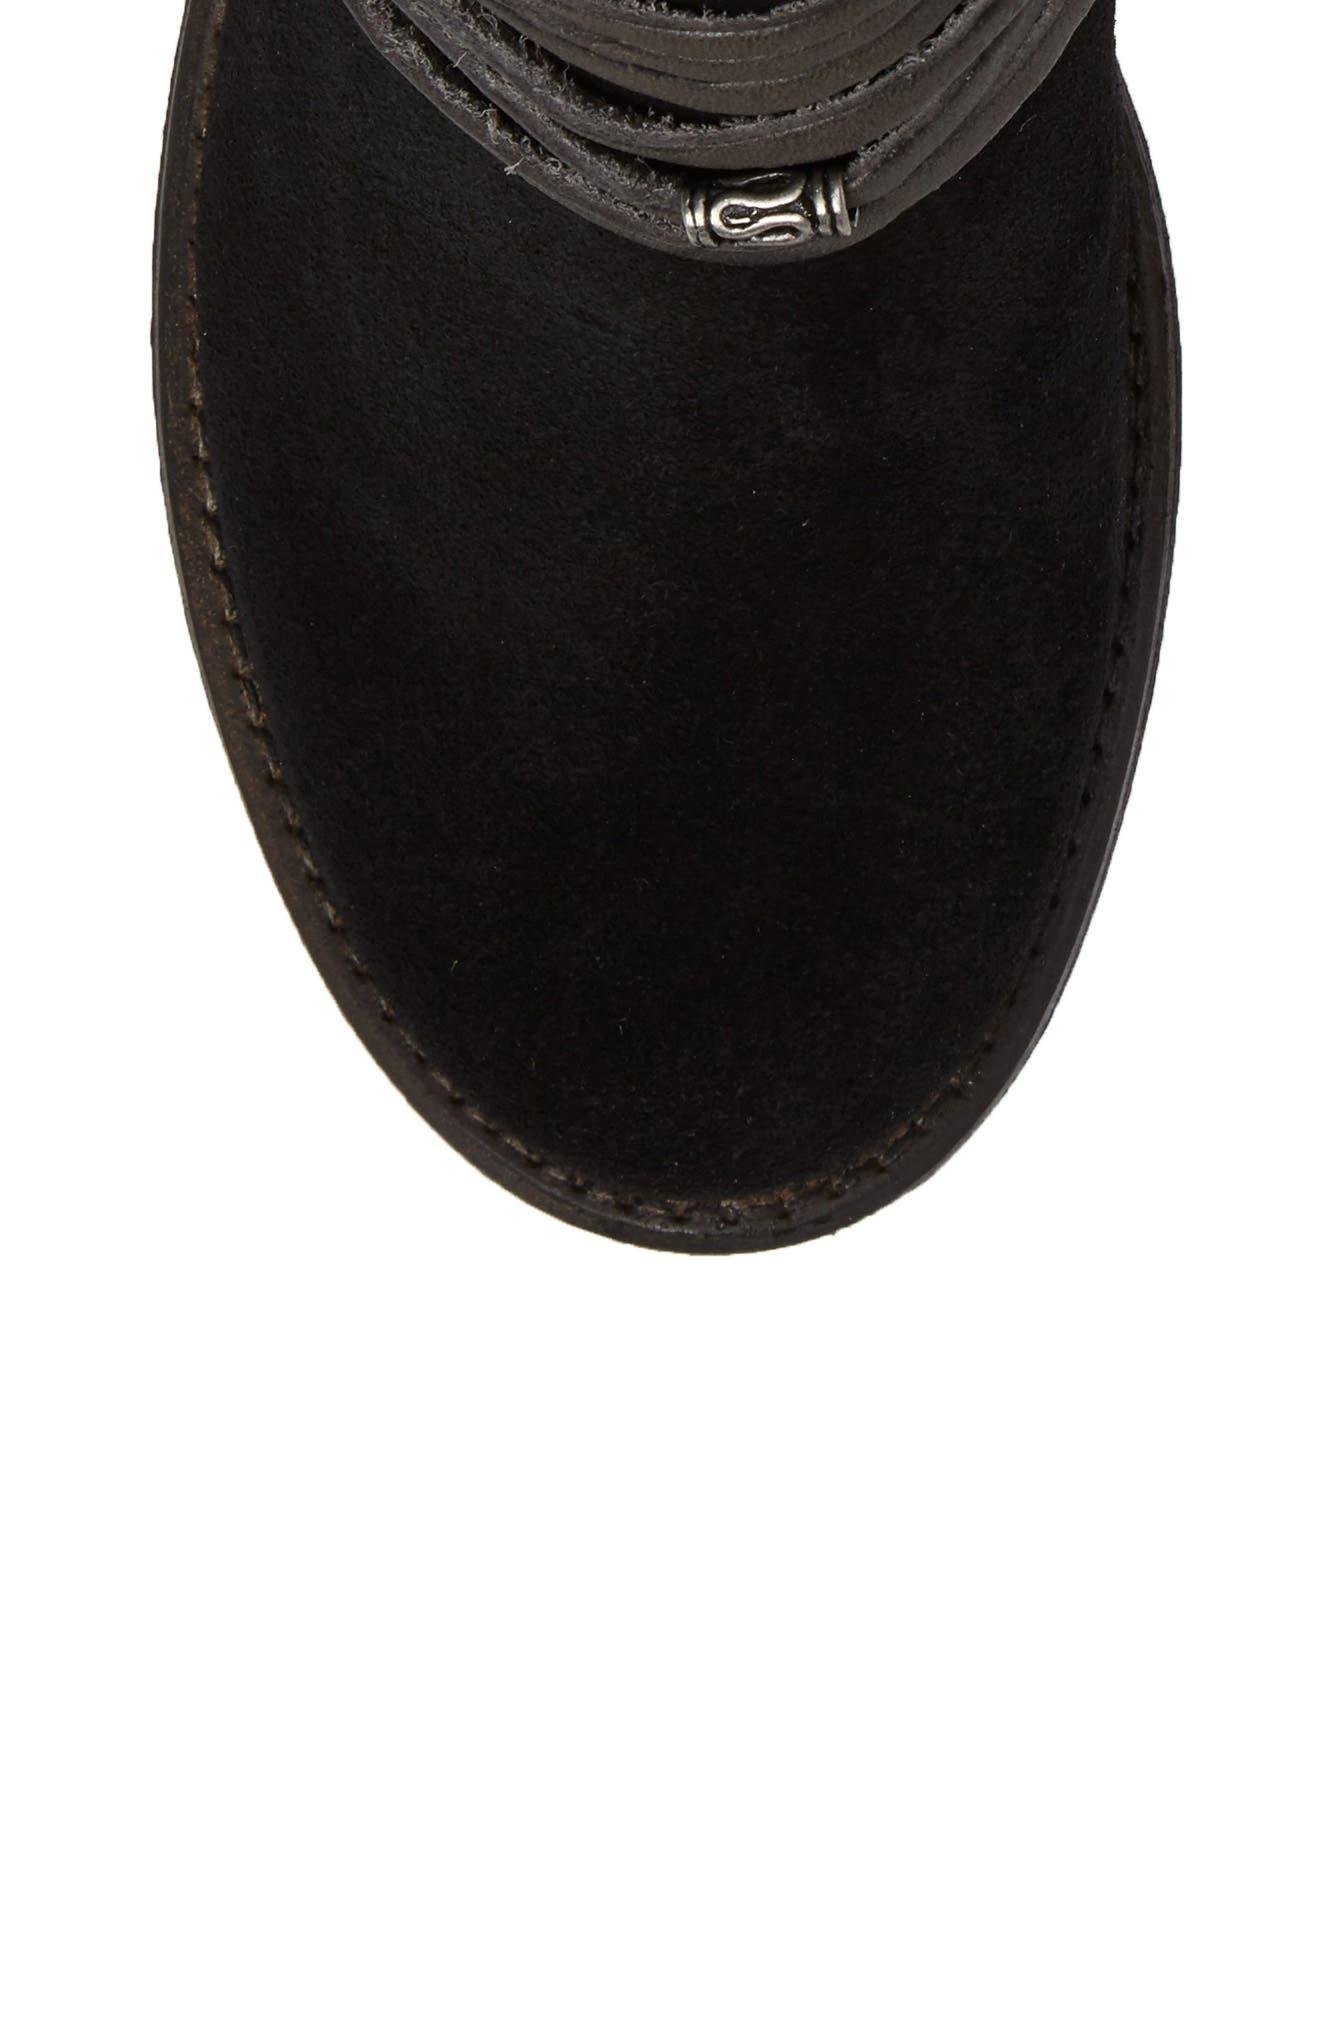 McCall Waterproof Boot,                             Alternate thumbnail 5, color,                             001